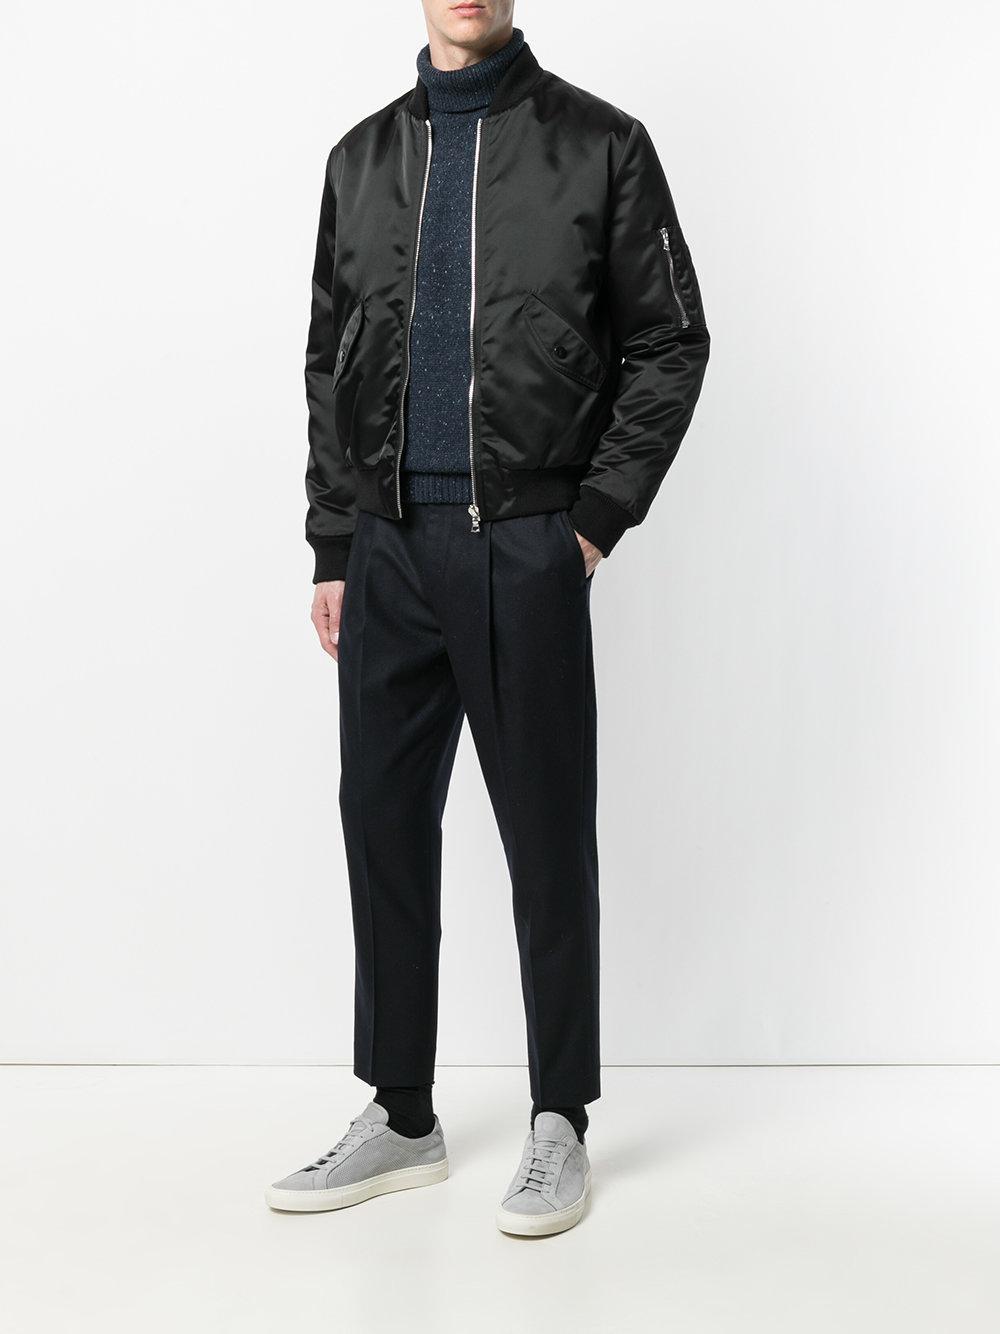 Harmony Synthetic Bomber Jacket in Black for Men